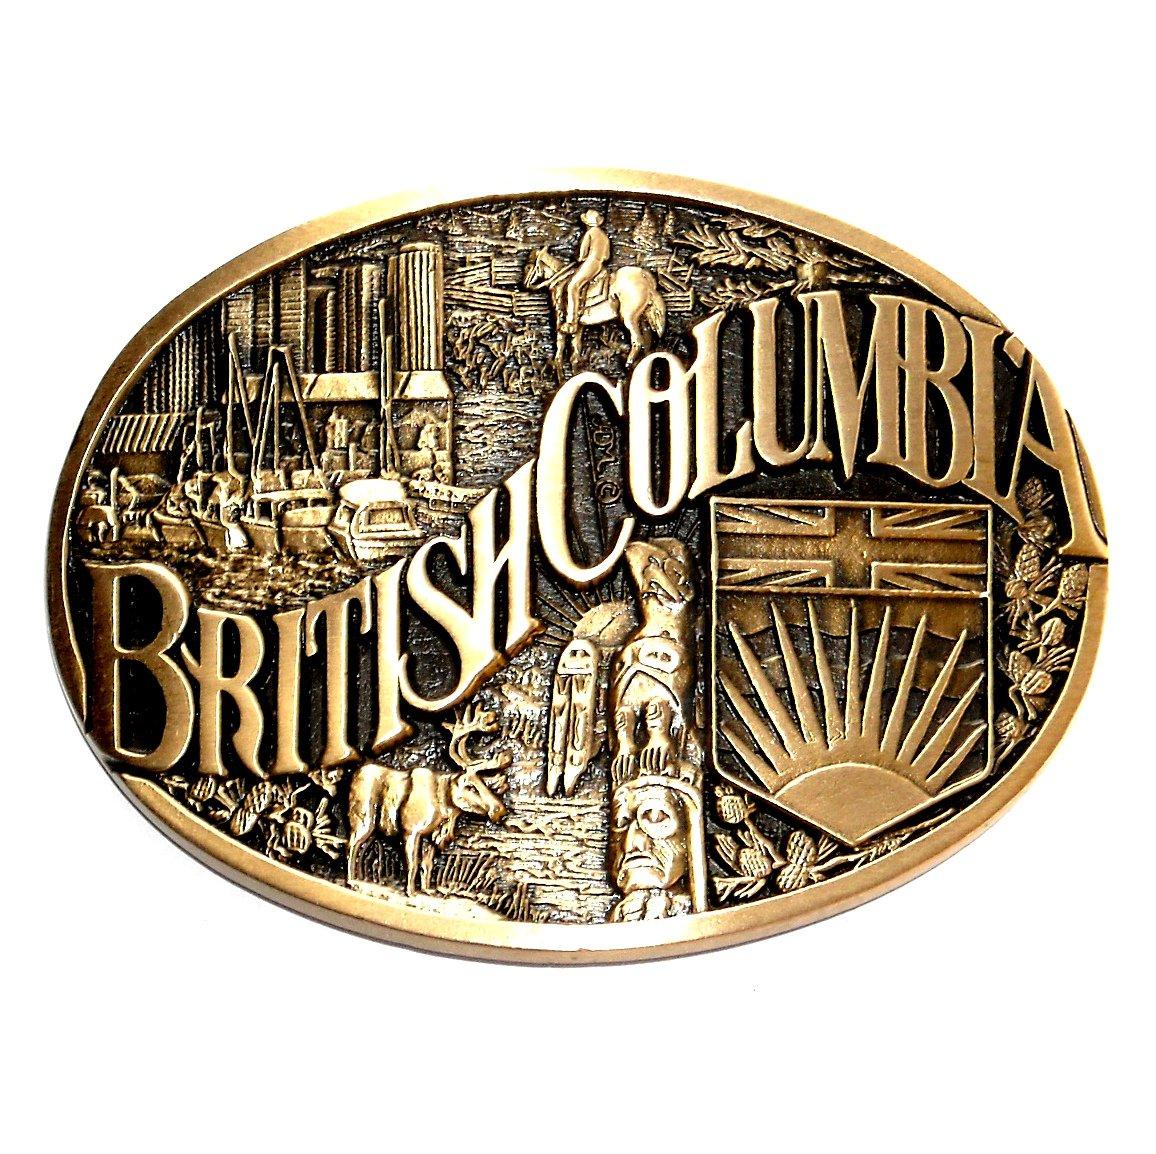 British Columbia First Edition Award Design Brass Belt Buckle